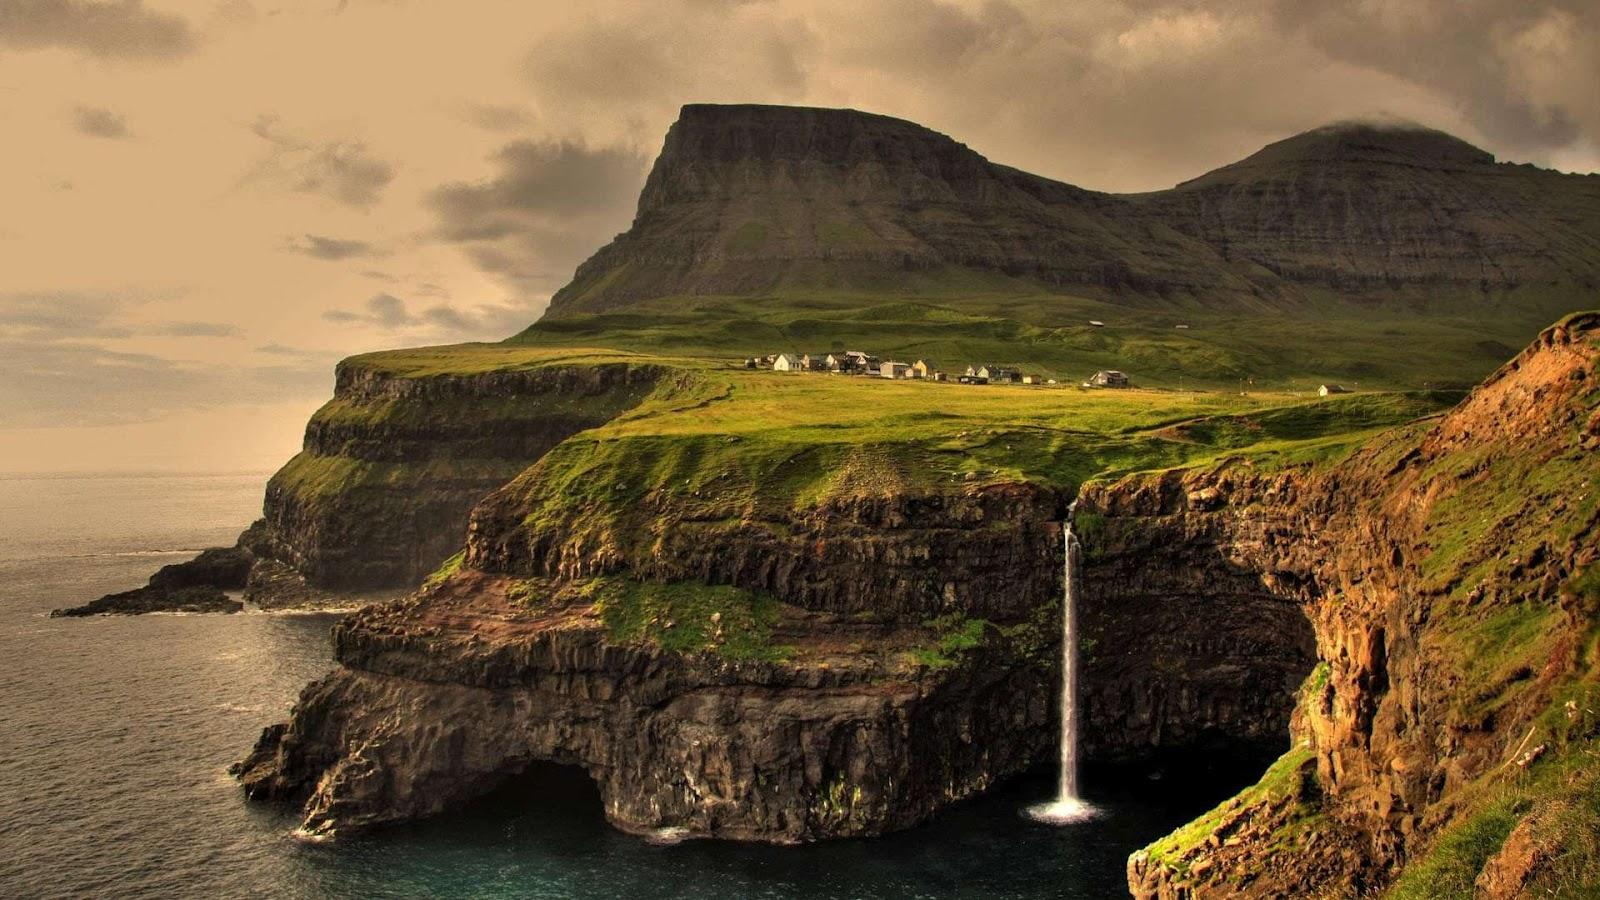 49] Ireland Landscapes Wallpaper on WallpaperSafari 1600x900